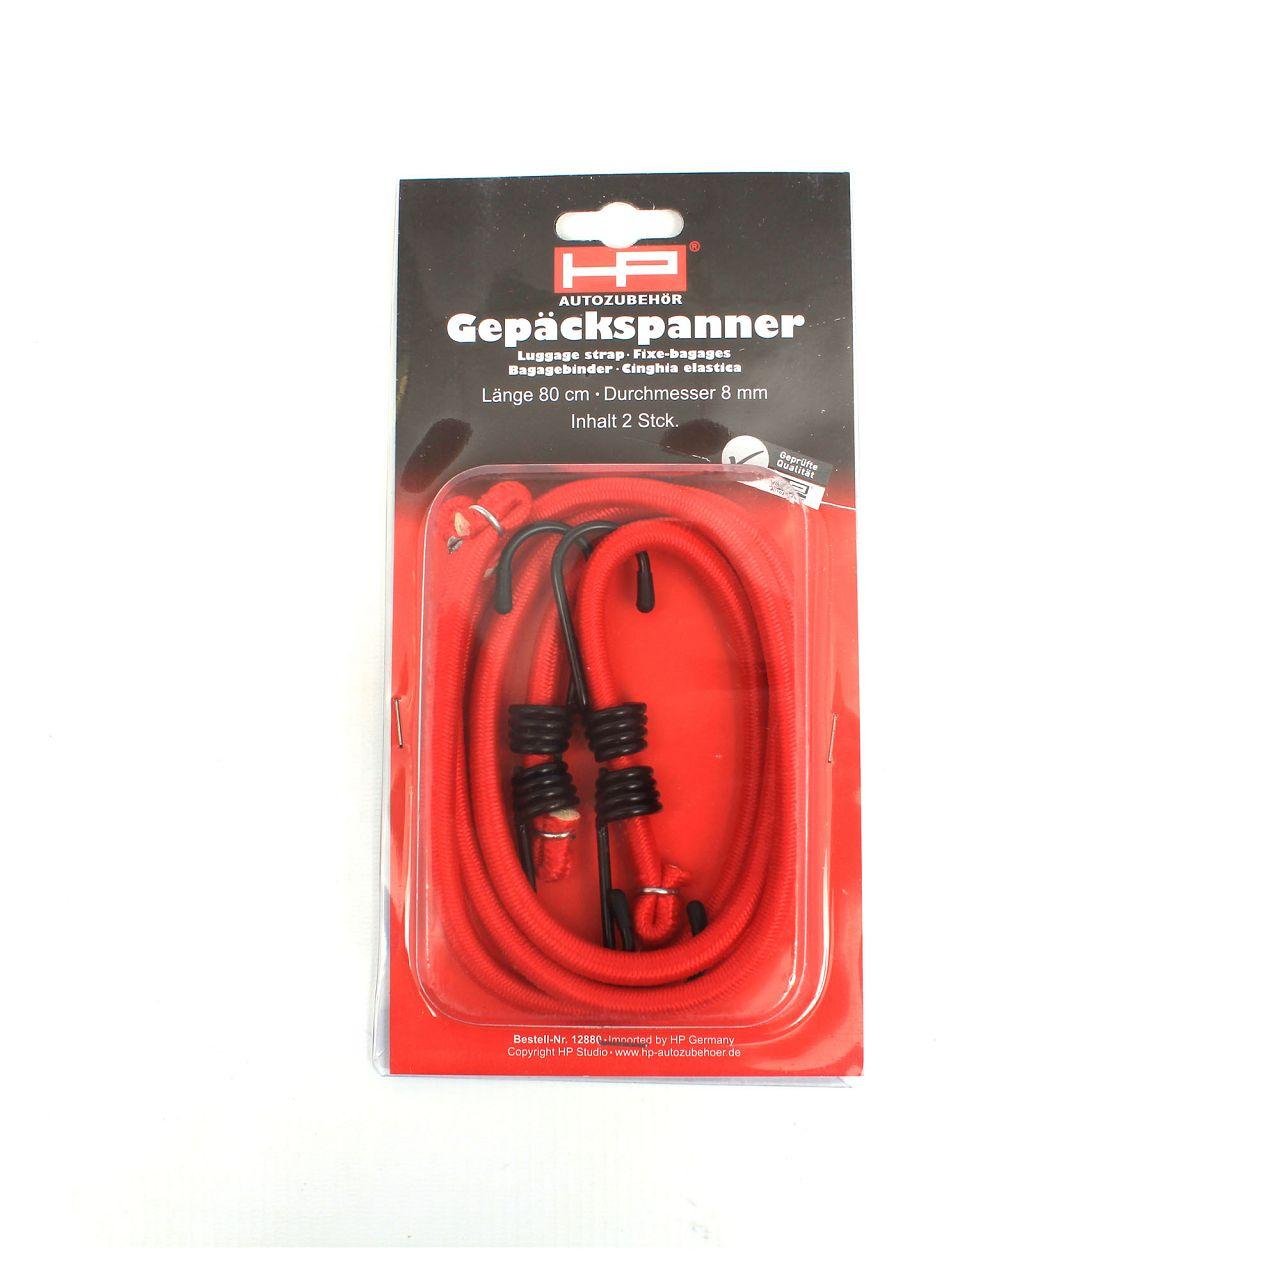 HP 12880 Expanderband Gepäckspanner Spannband Set 2x Ø 8 mm Länge 80 cm